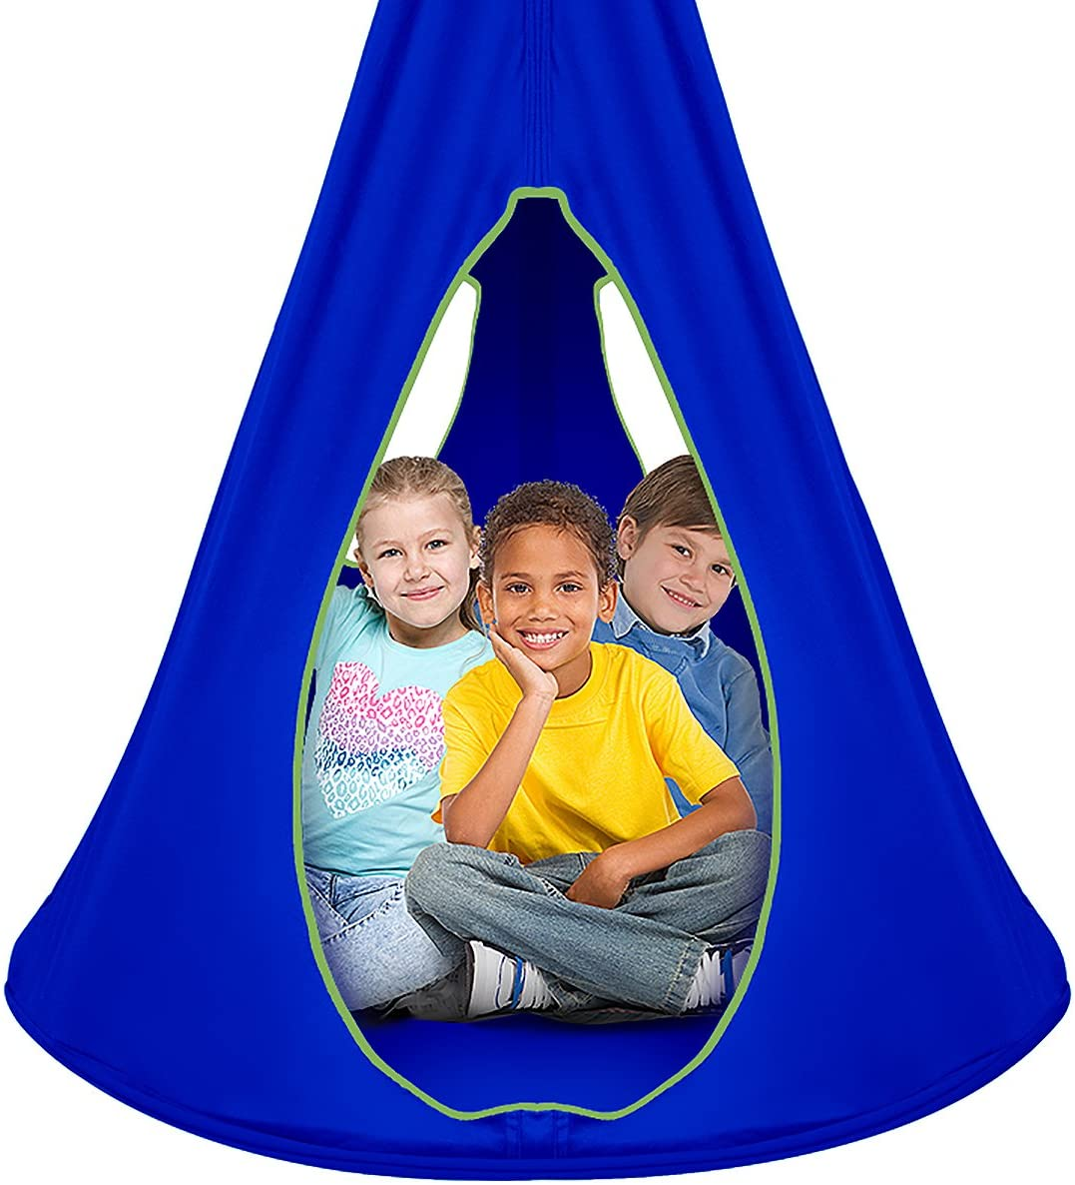 Sorbus Kids Nest Swing Chair Nook Hanging Seat Hammock for Indoor Outdoor Use Great for Children 40 Inch, Nest Blue